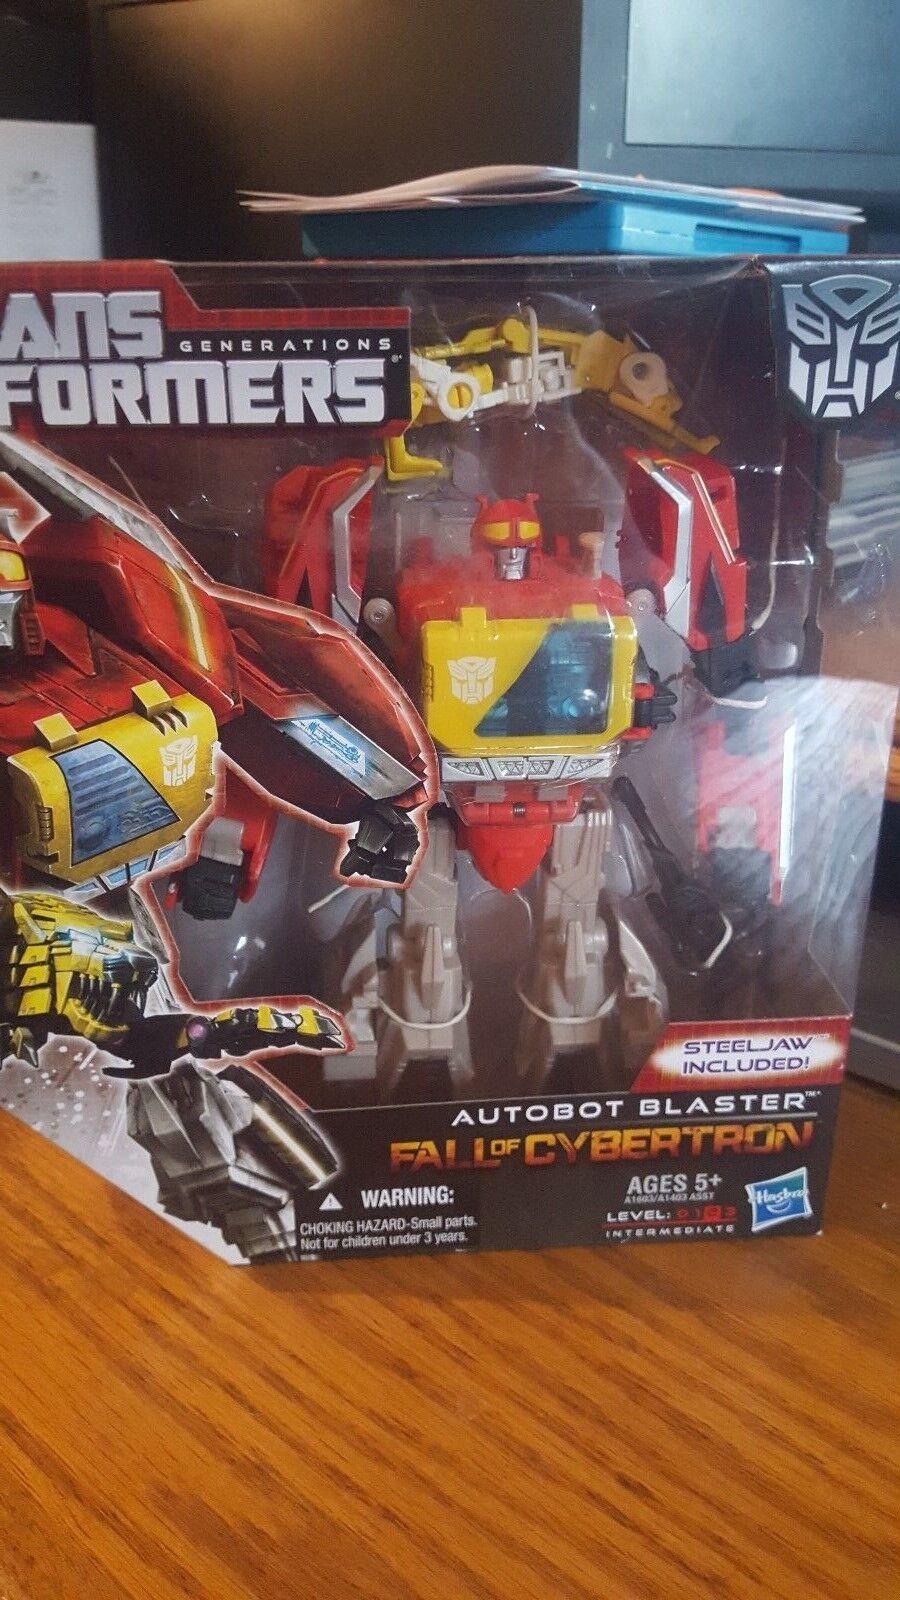 Transfromers Generations Fall of Cybertron Autobot Blaster misp